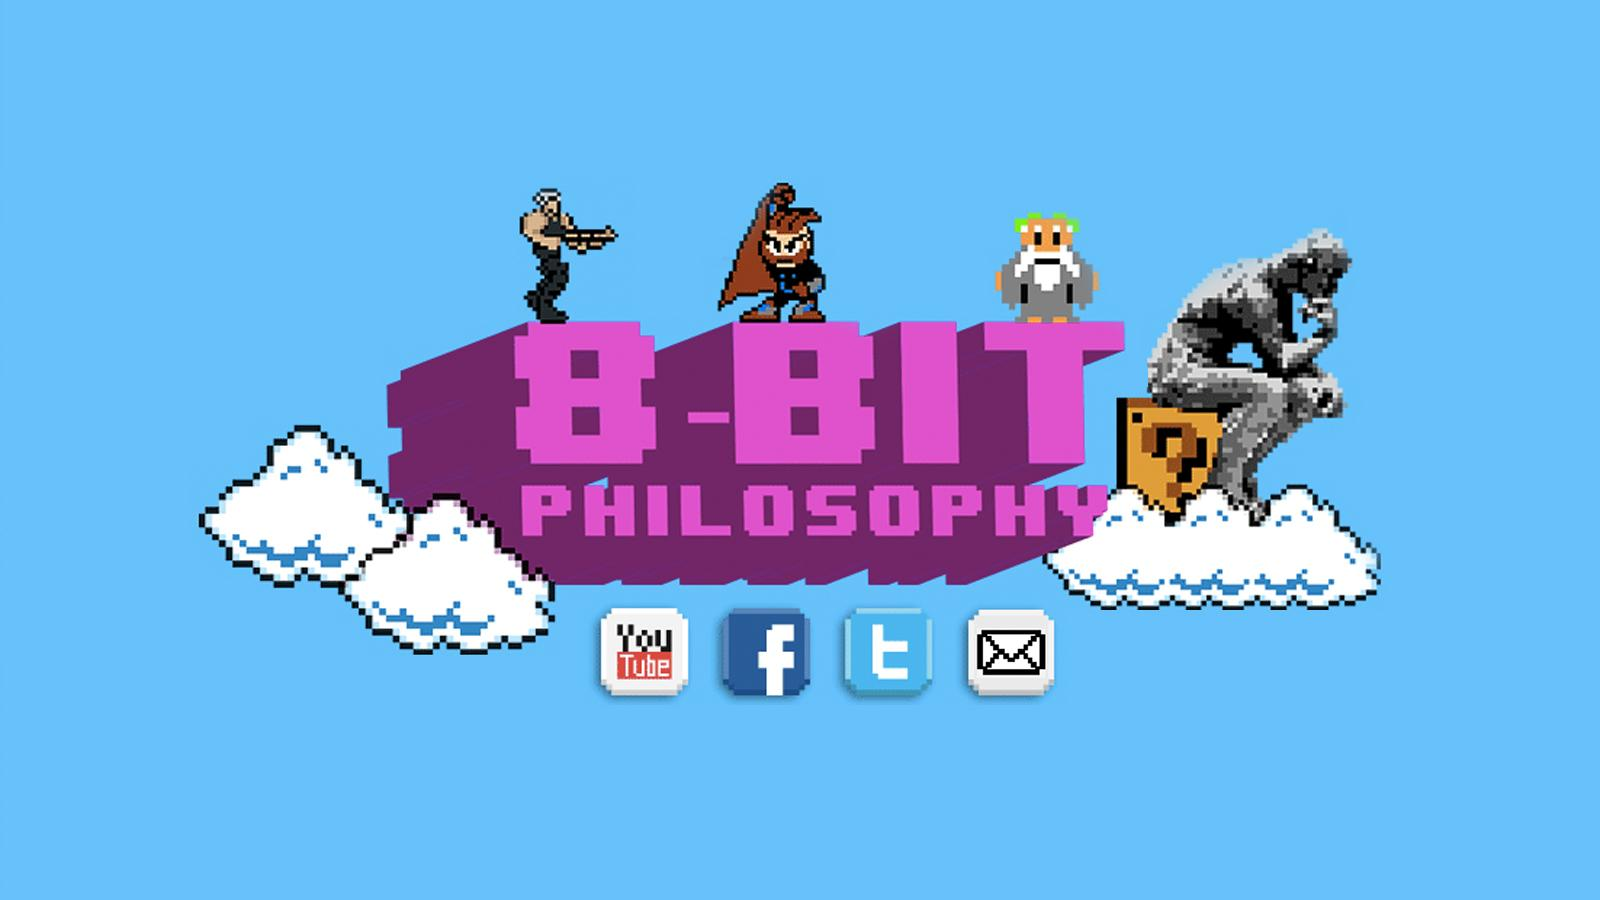 8 Bit Philosophy